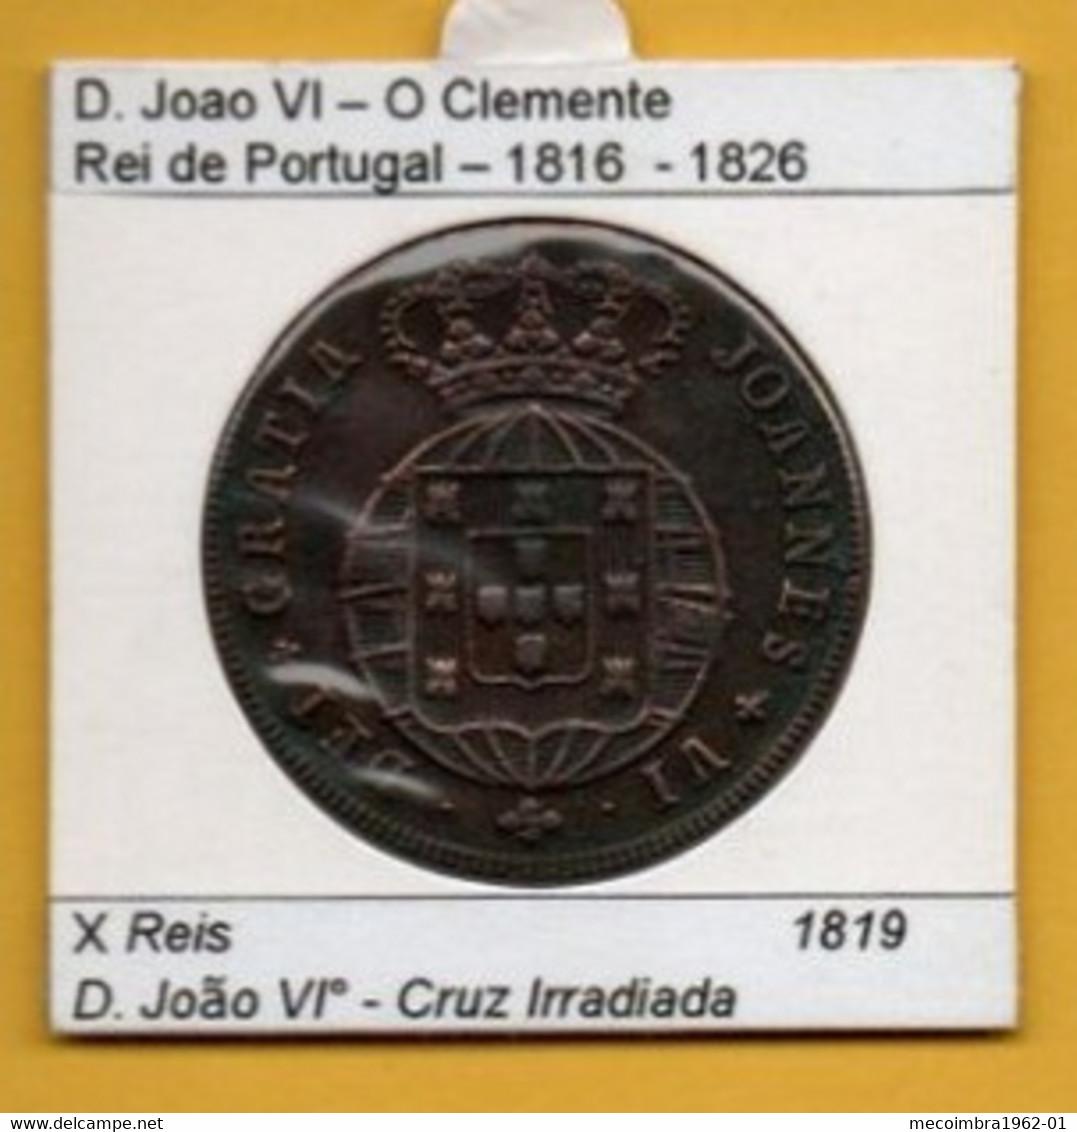 Portugal - D.João VI° - X Reis 1819 Cruz Irradiada - J6 - AG.03.03  Rare - Portugal